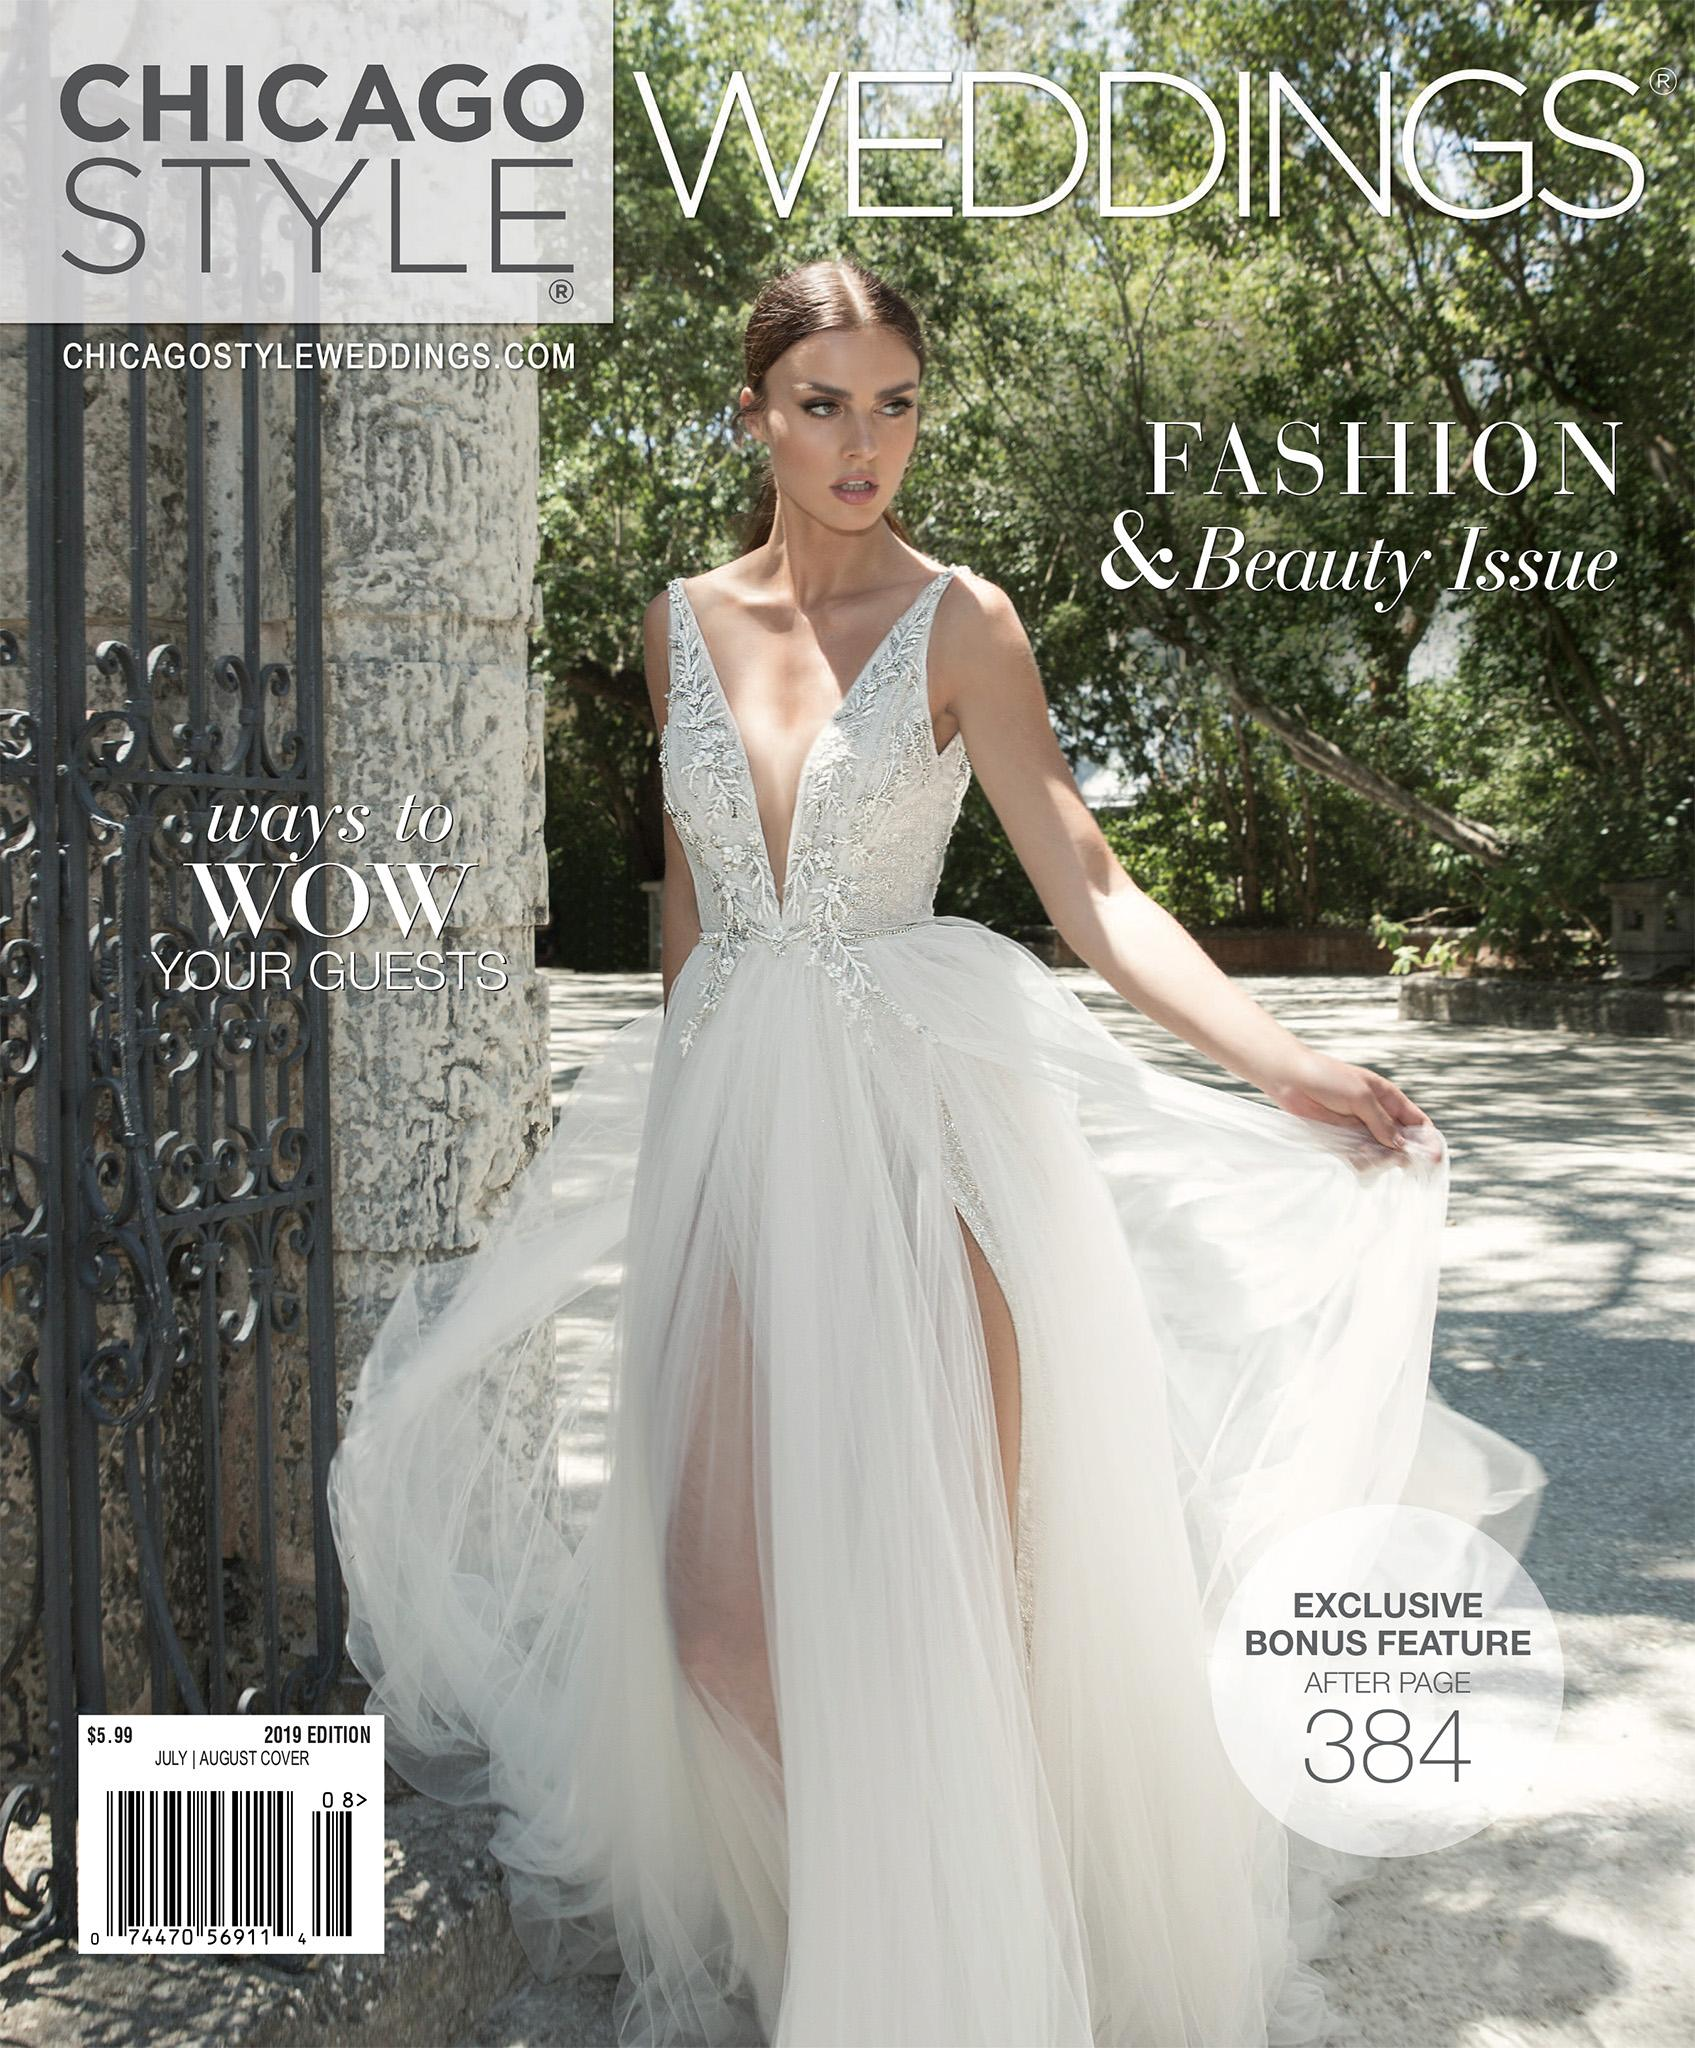 ChicagoStyle Weddings - July 2018 - July / August 2019 Issue | Wedding Magazine | Chicago Magazine